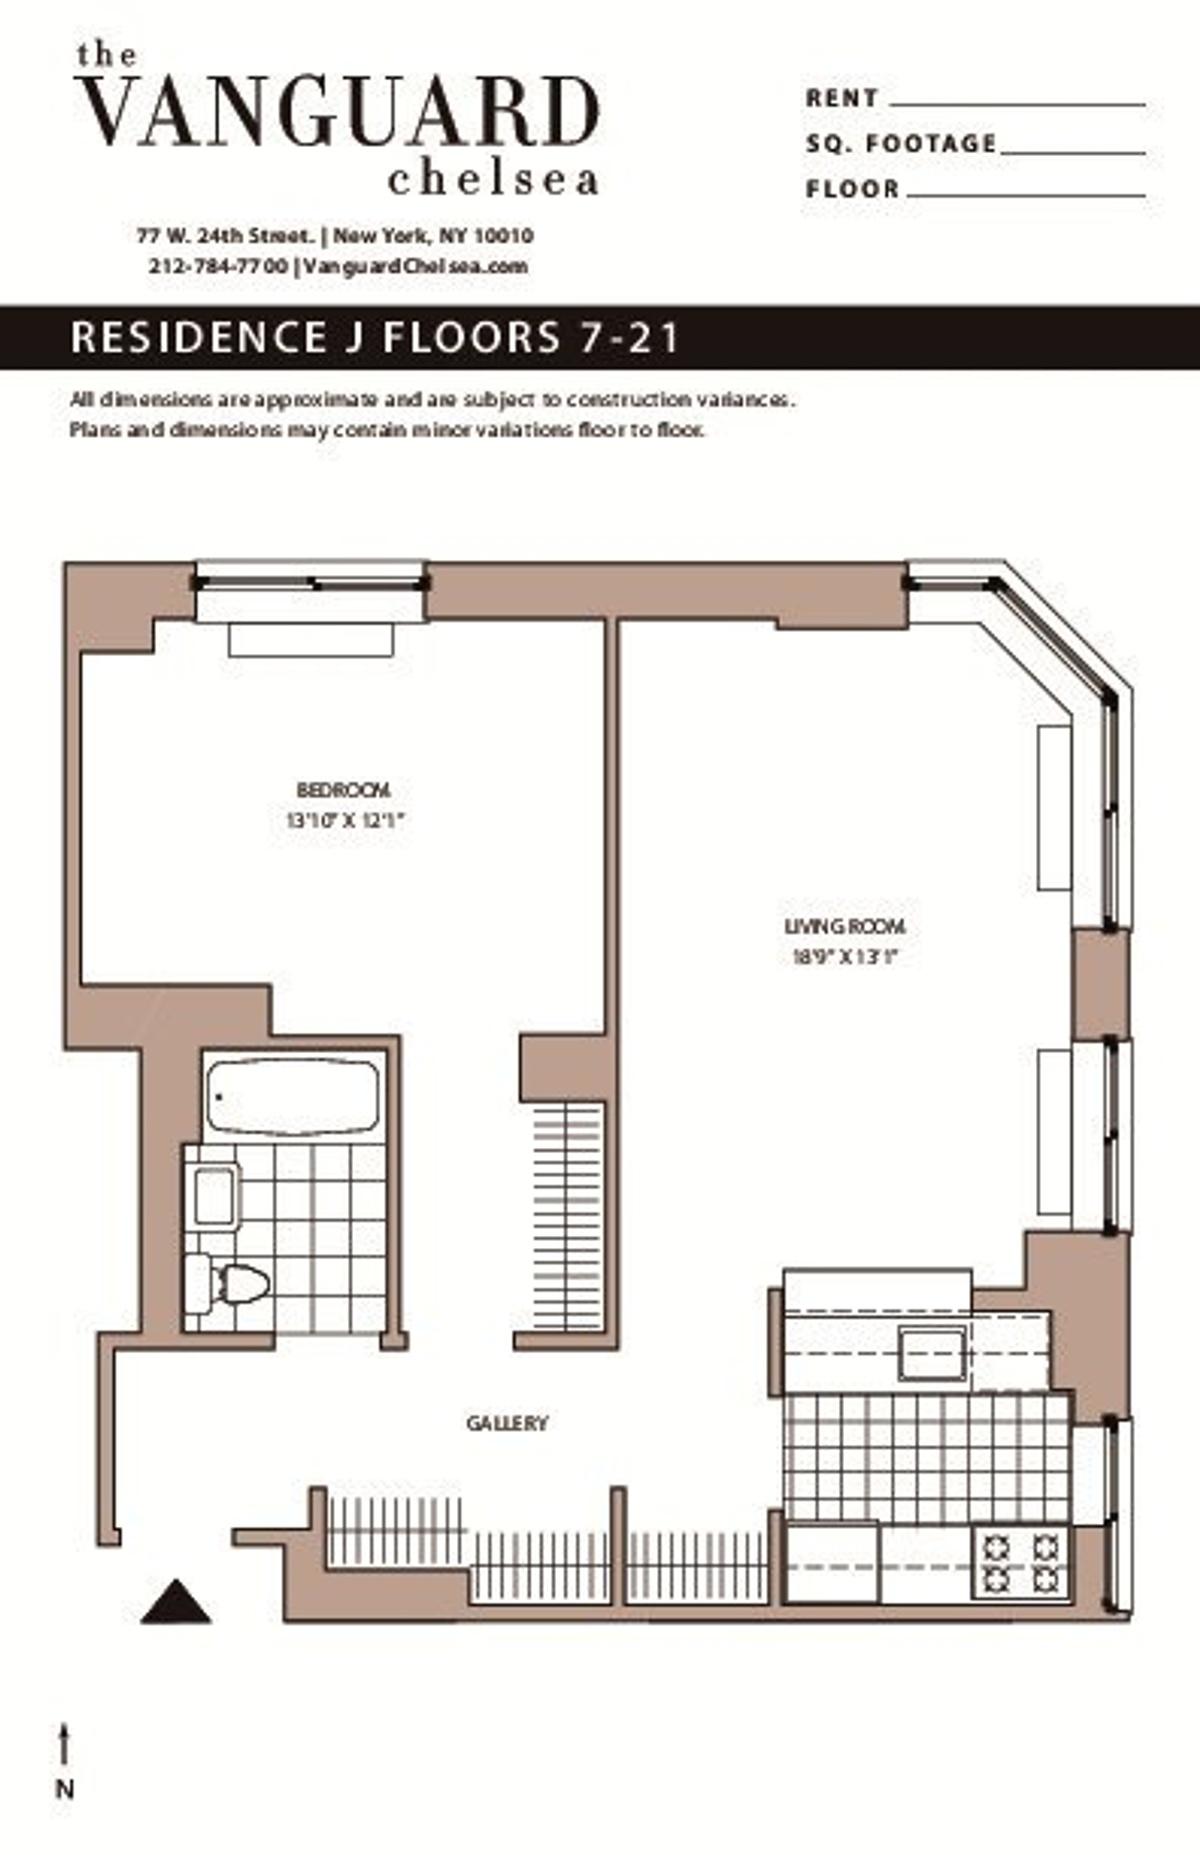 West 24th Street Rental Highline Residential Valet Intercom Wiring Diagram Image For